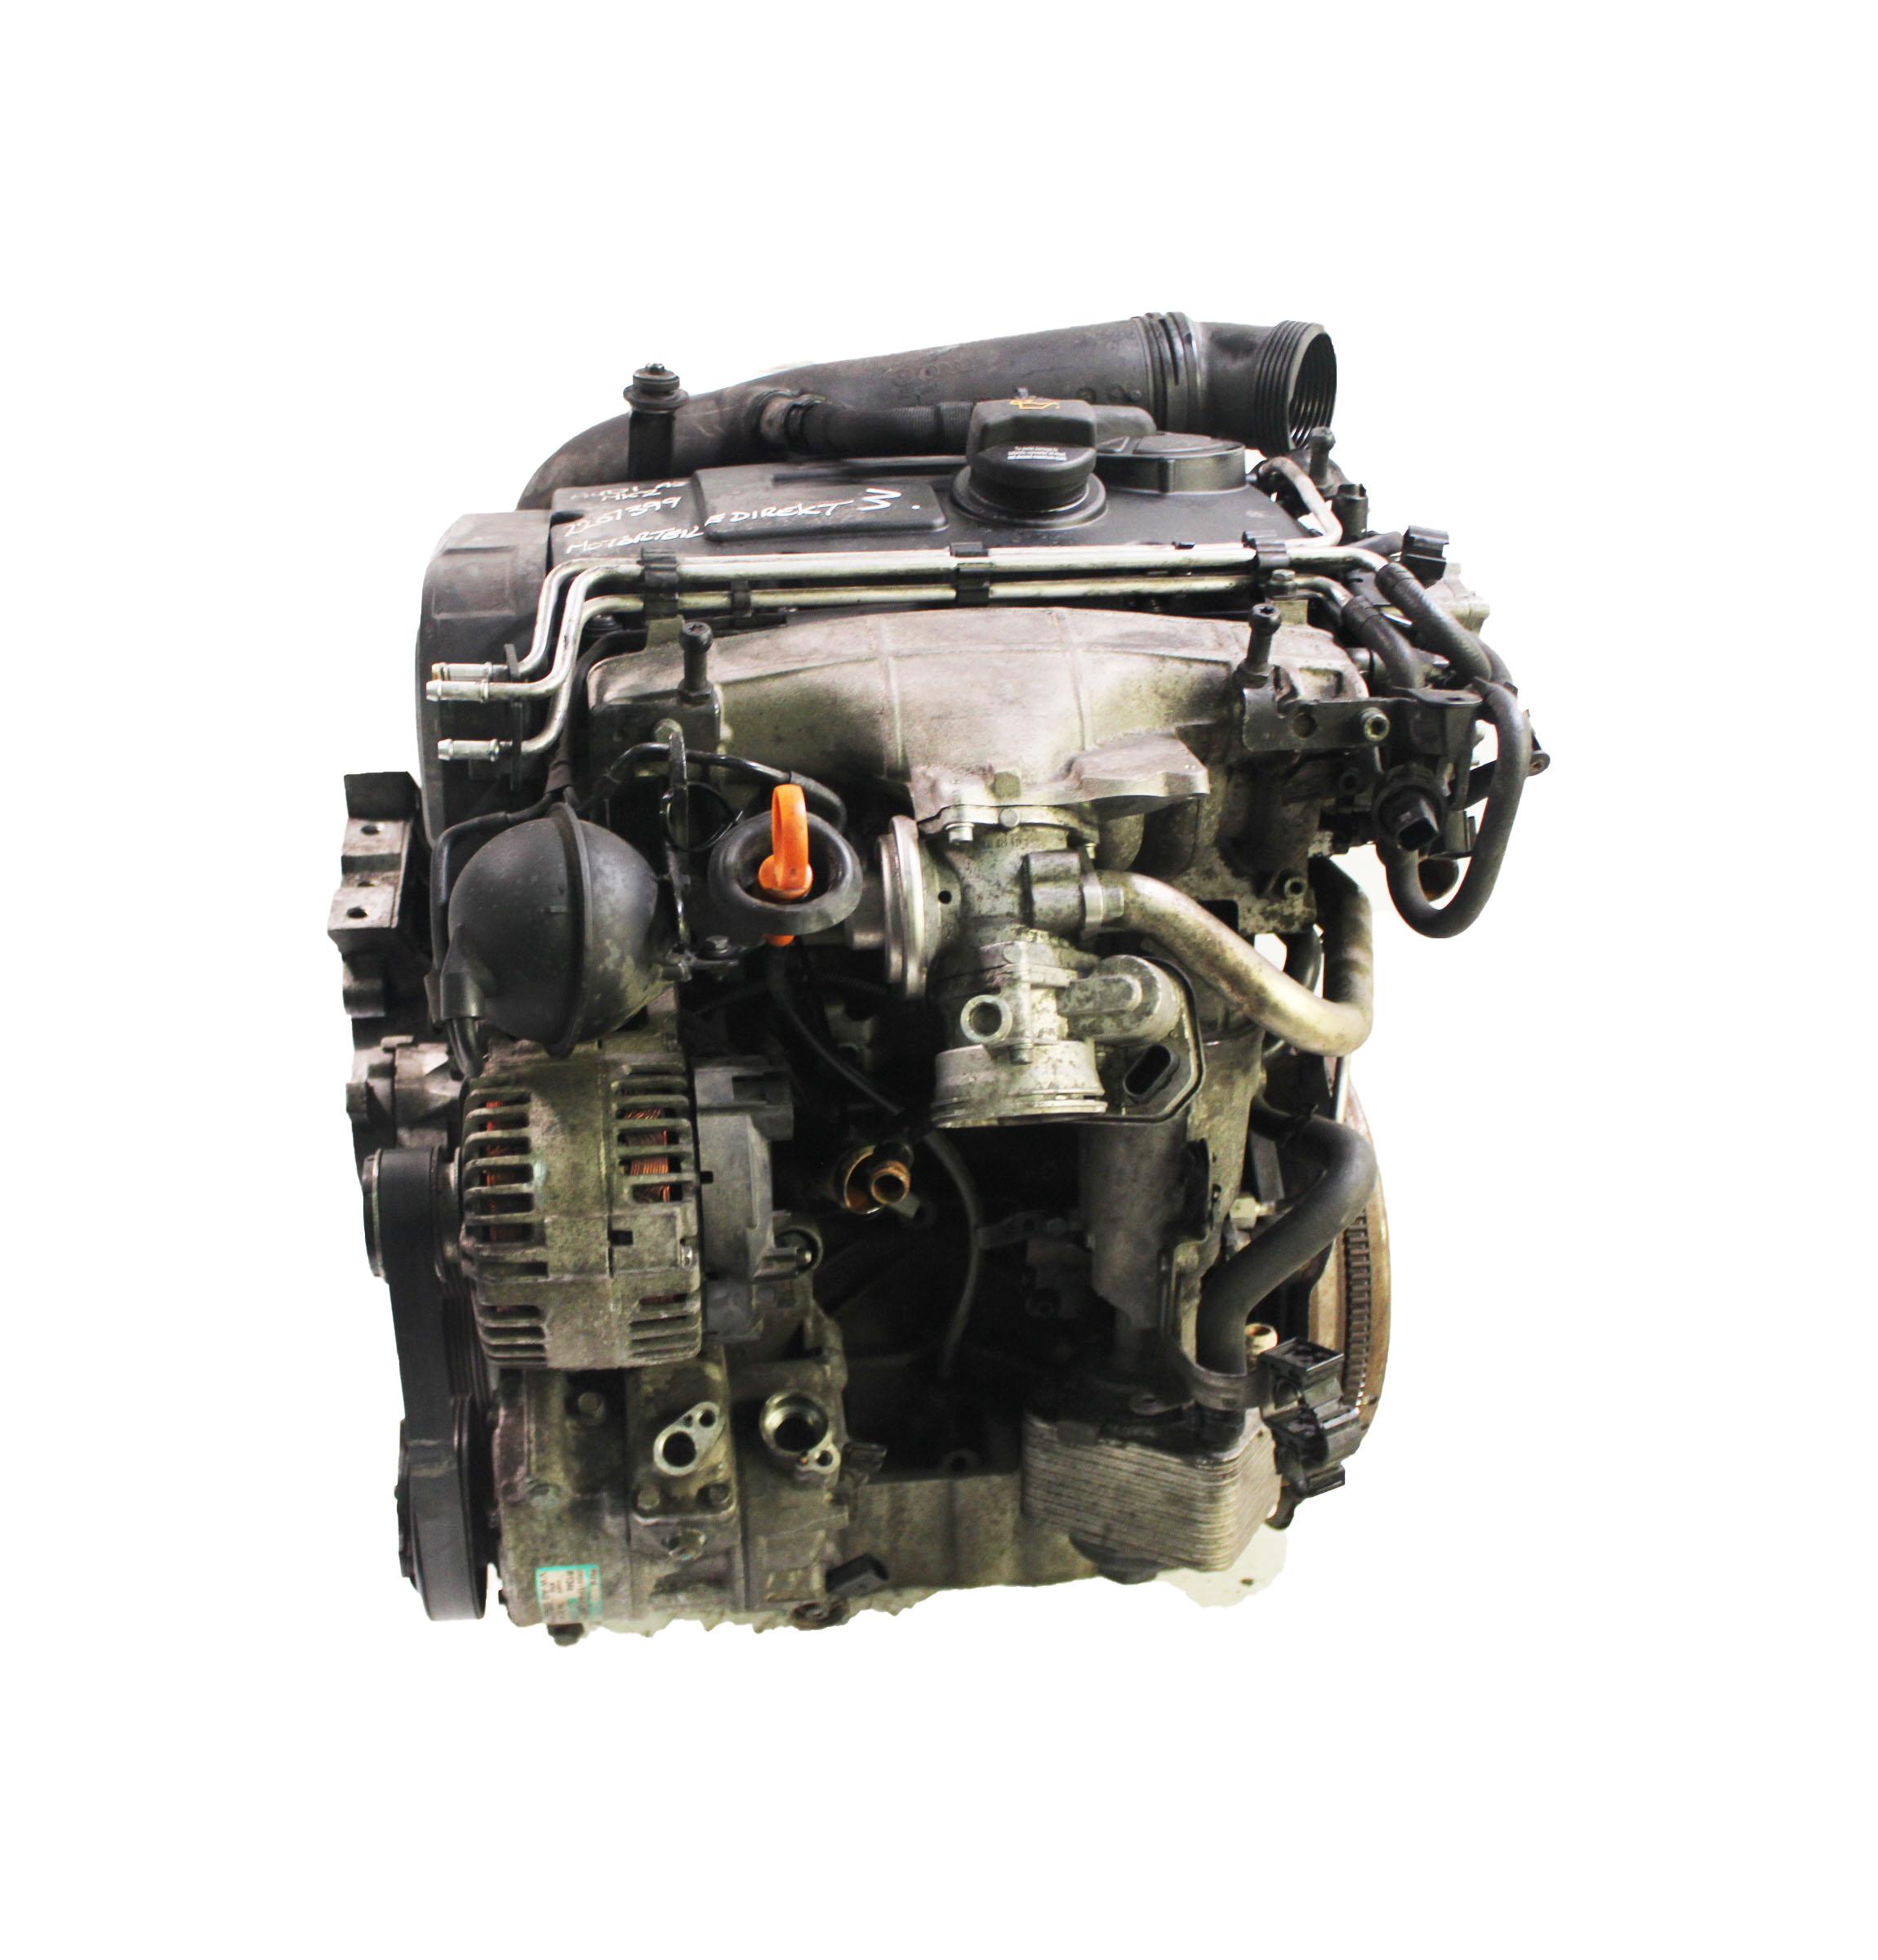 Motor für Audi A3 8P A5 2,0 TDI Diesel BKD 140 PS 103 KW